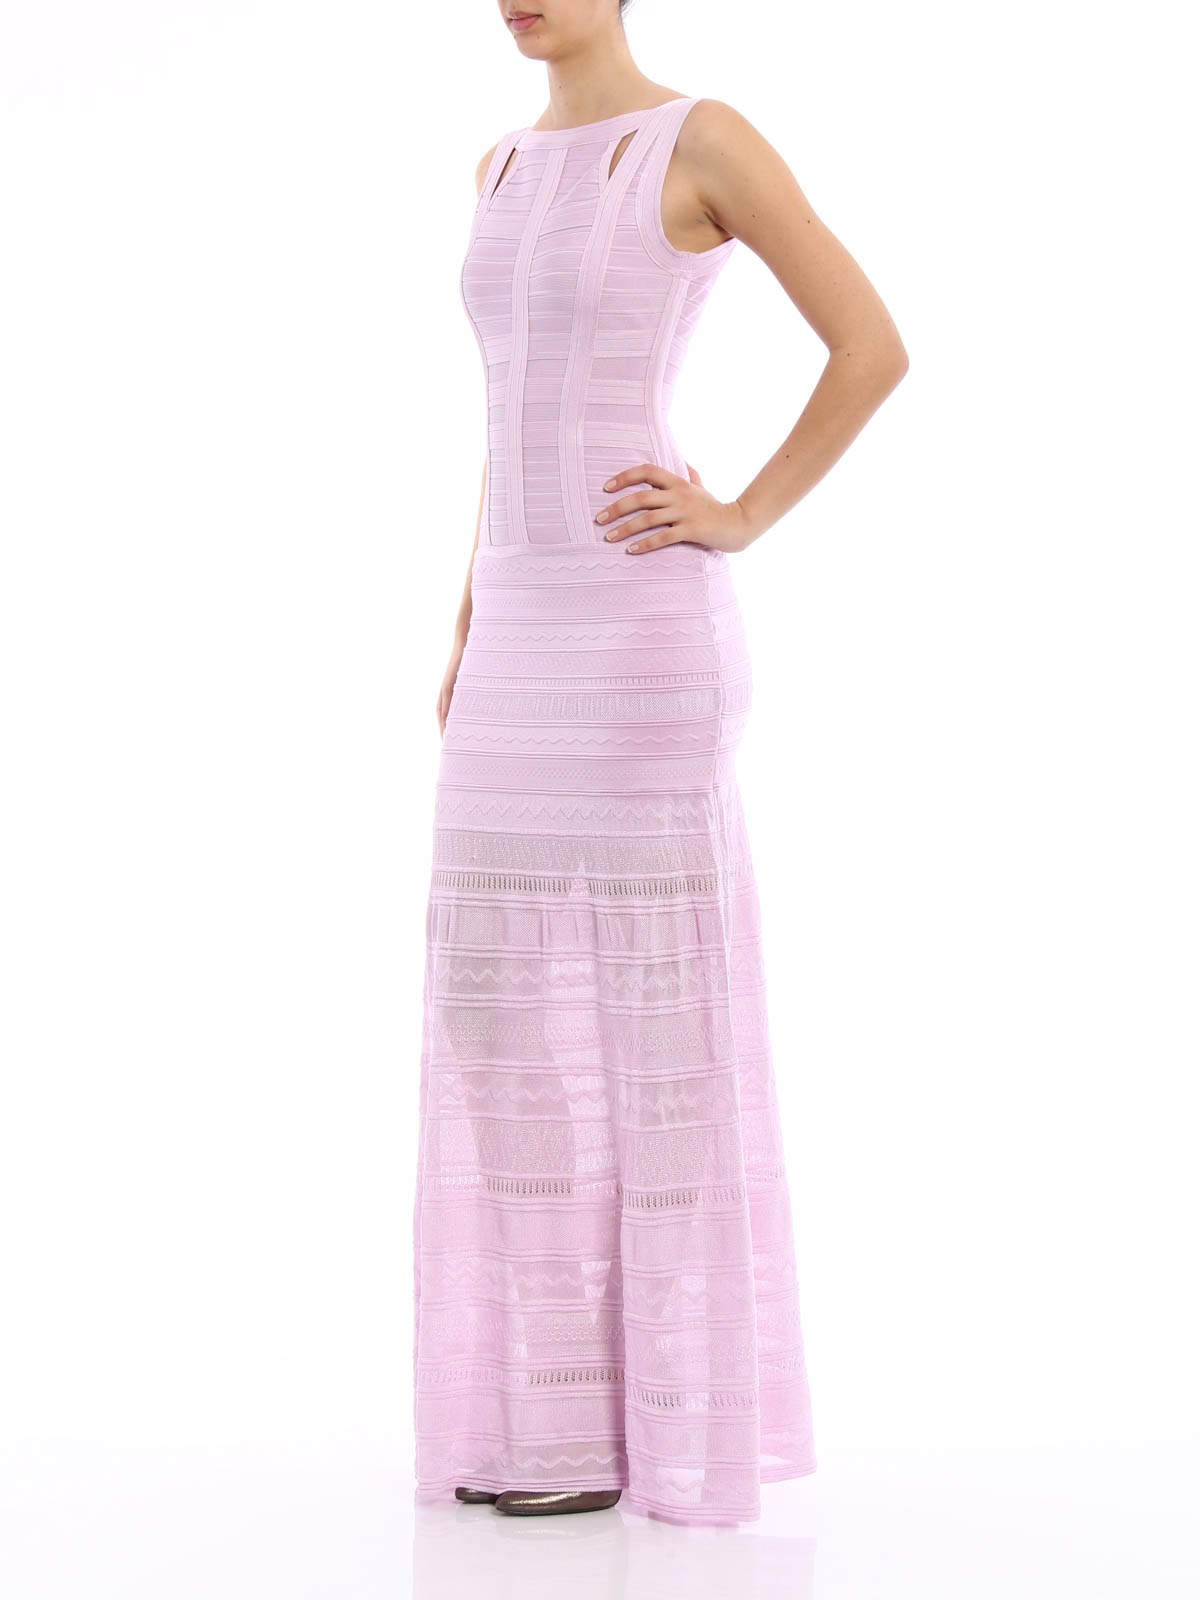 Herve Leger - Alejandra dress - evening dresses - HZW65H18 689 116